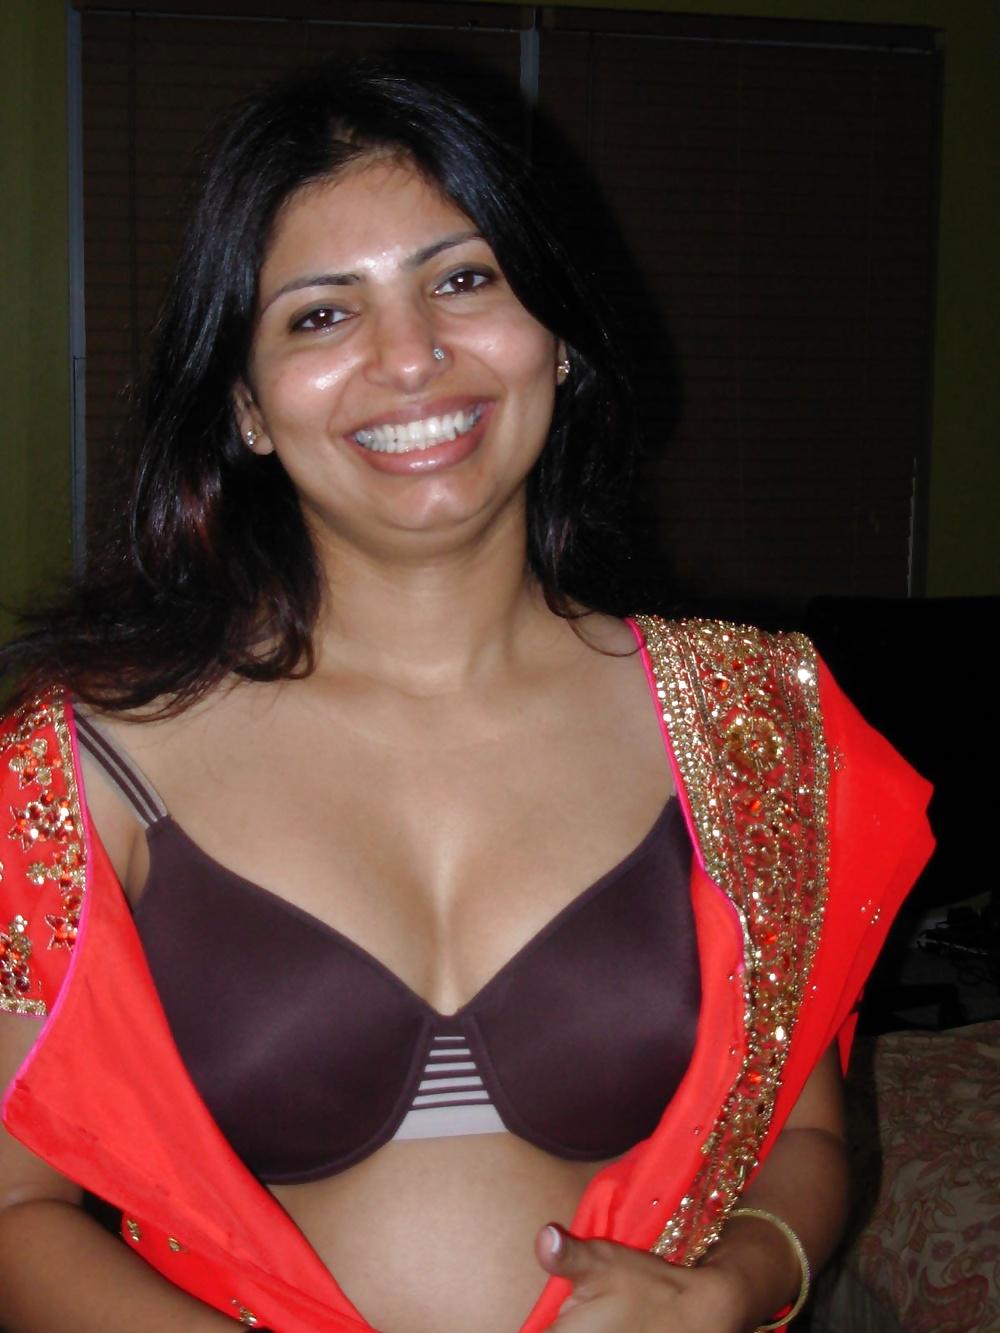 Hot indian girl huge boobs show